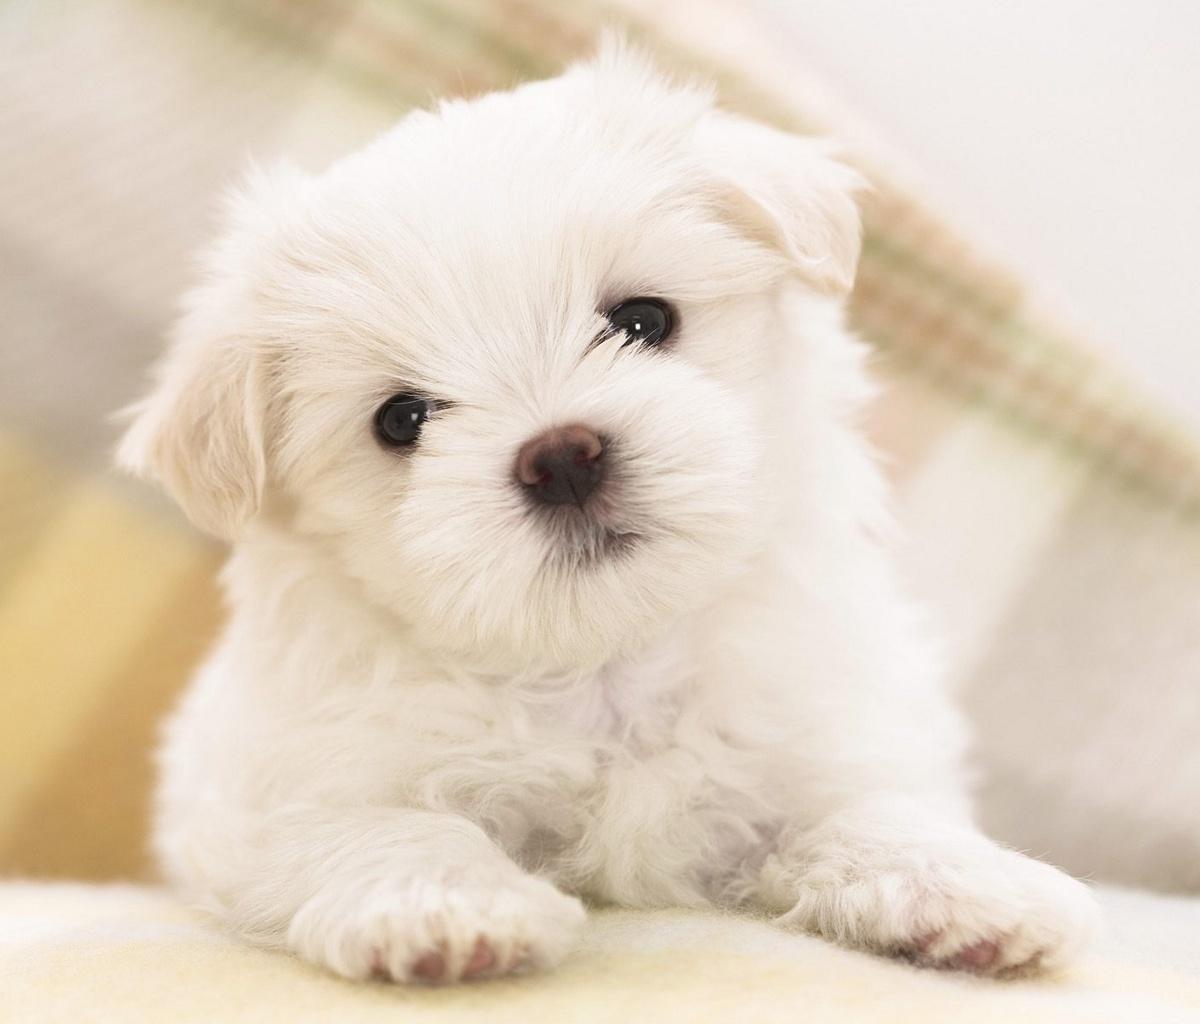 free 1200X1024 Cute Dog 1200x1024 wallpaper screensaver preview id 1200x1024